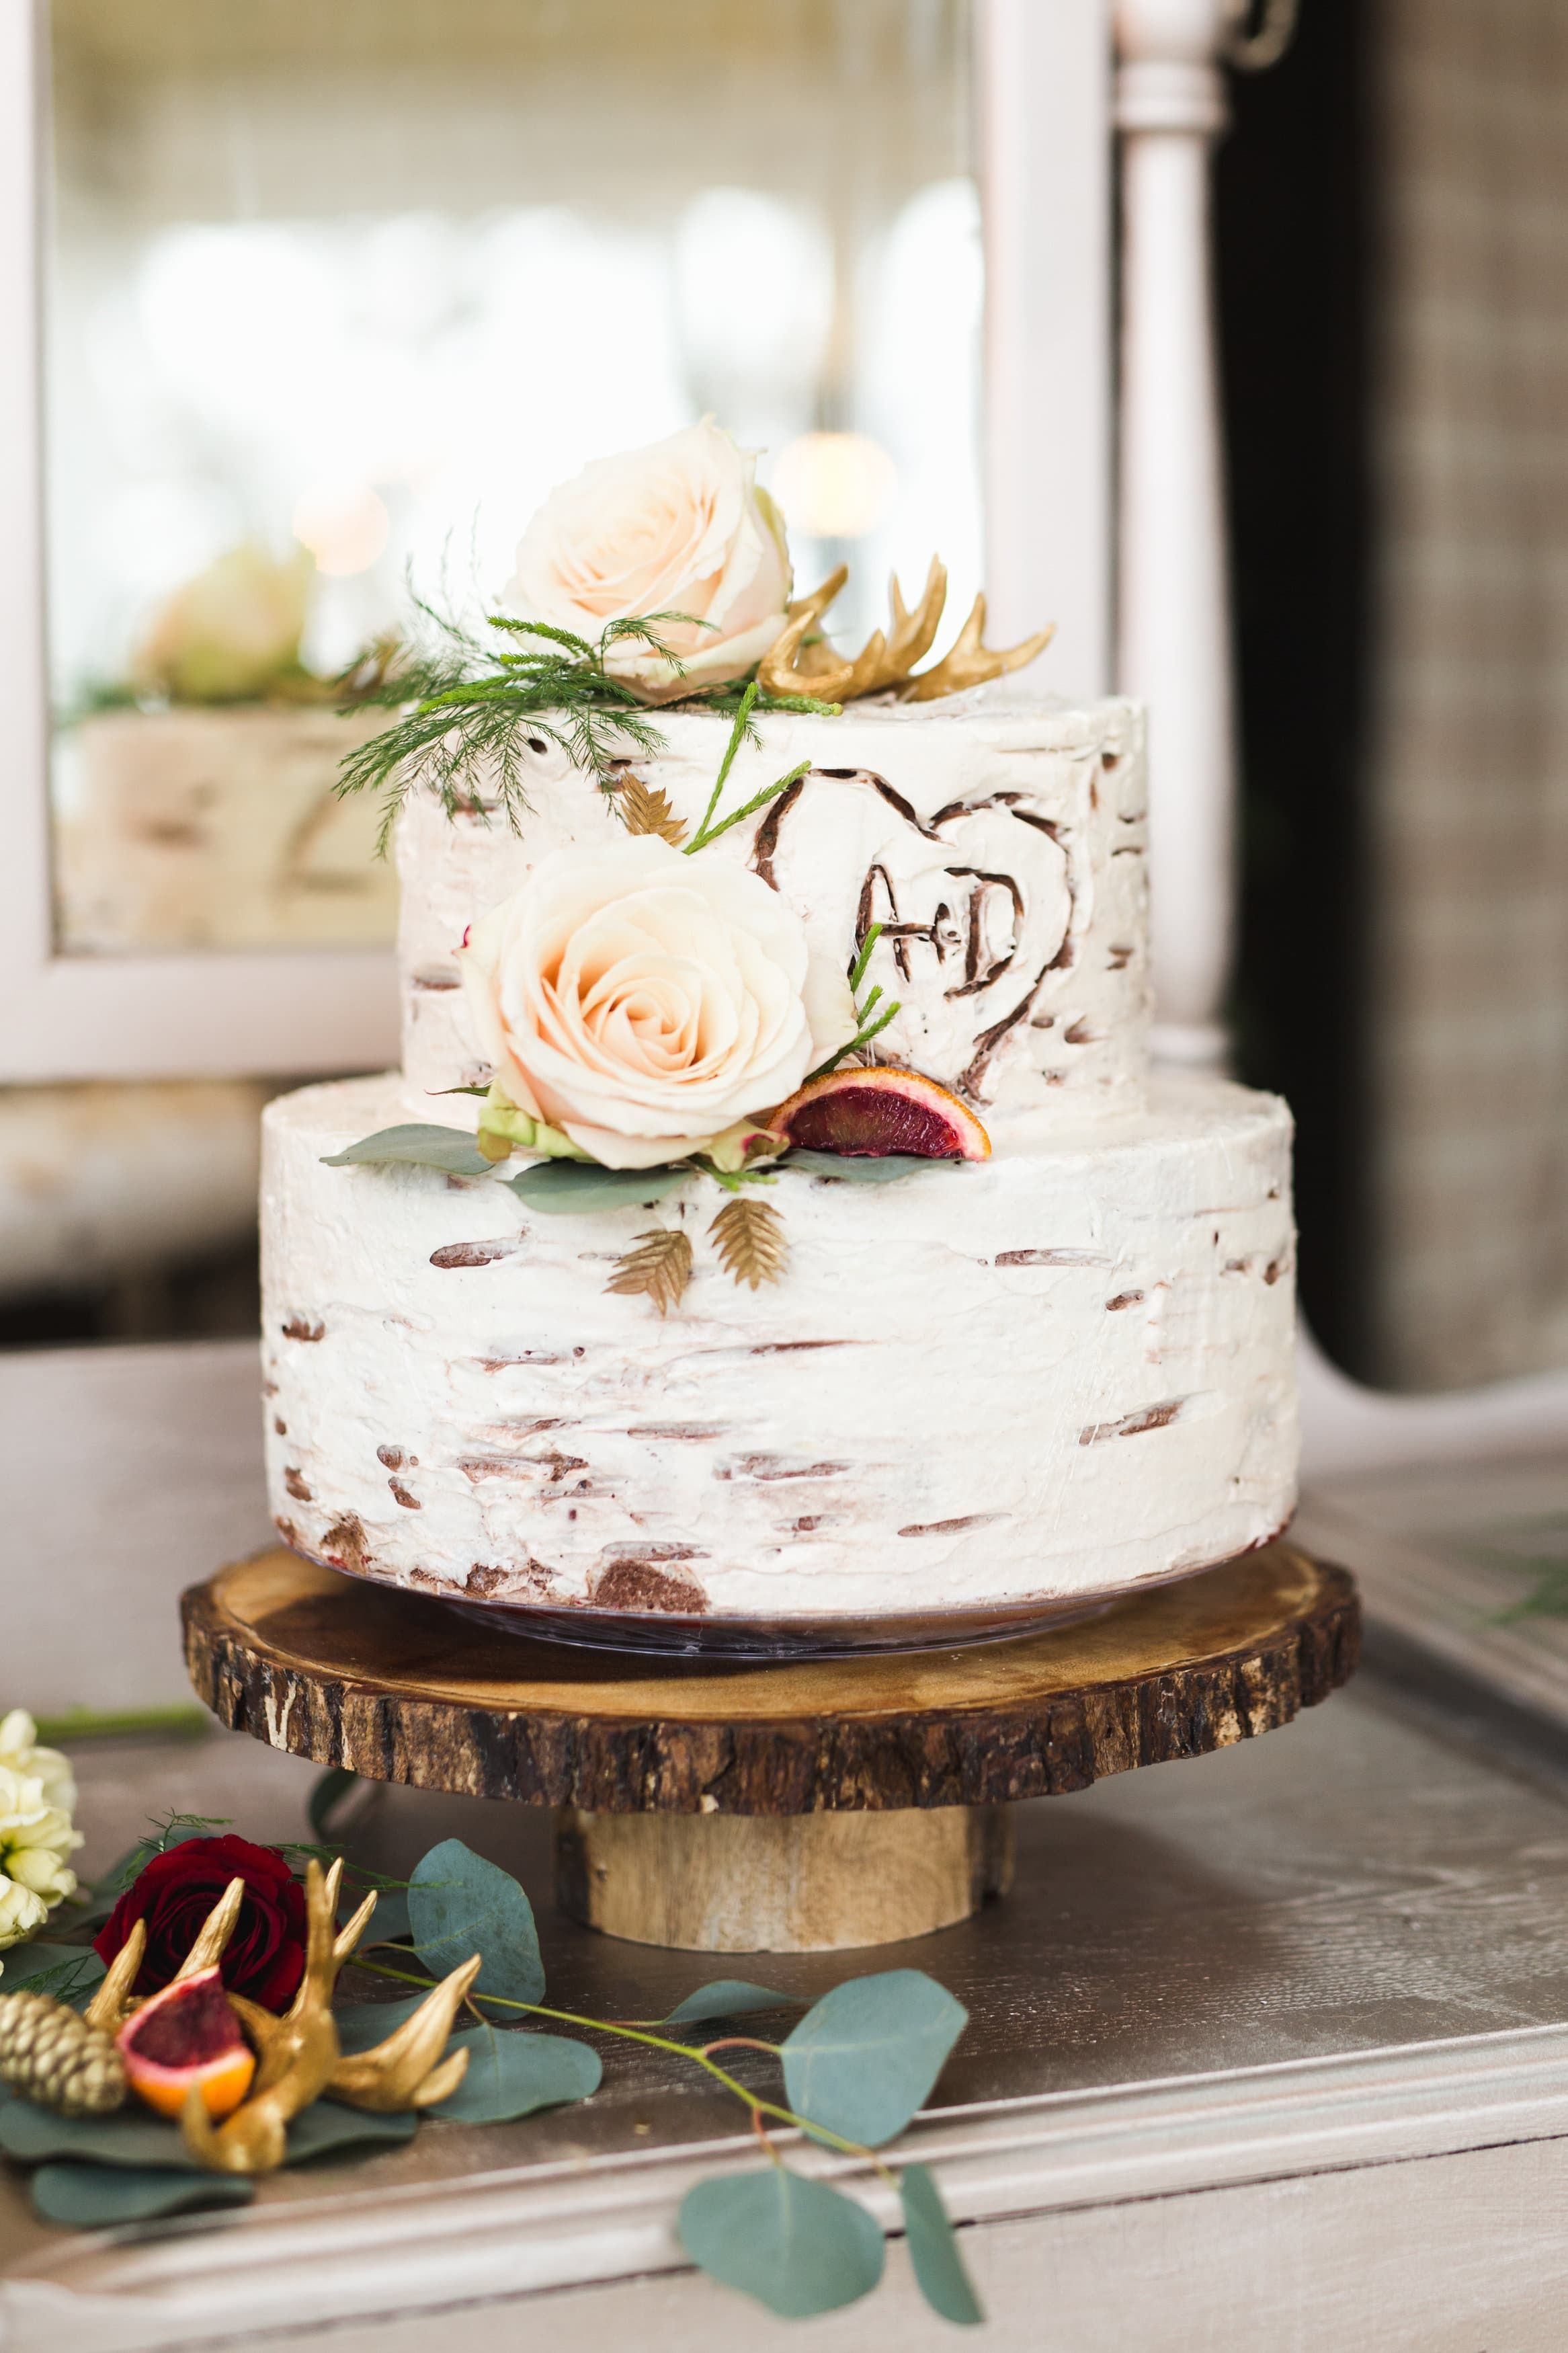 Rustic Romantic Inspiration | wedding cake ideas | Wedding ...